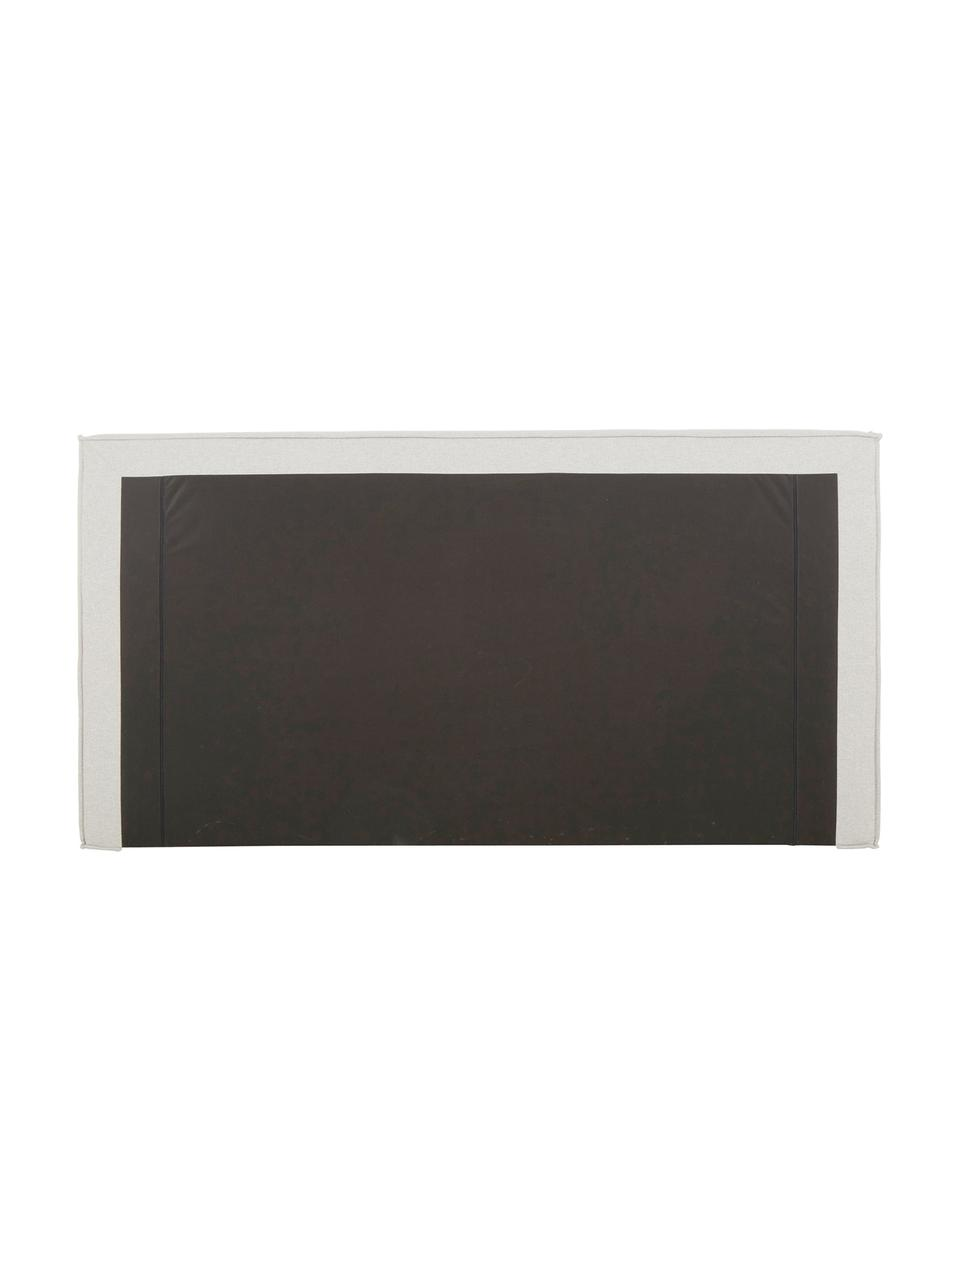 Polsterbett Dream, Korpus: Massives Kiefernholz und , Bezug: Polyester (Strukturstoff), Webstoff Beige, 180 x 200 cm